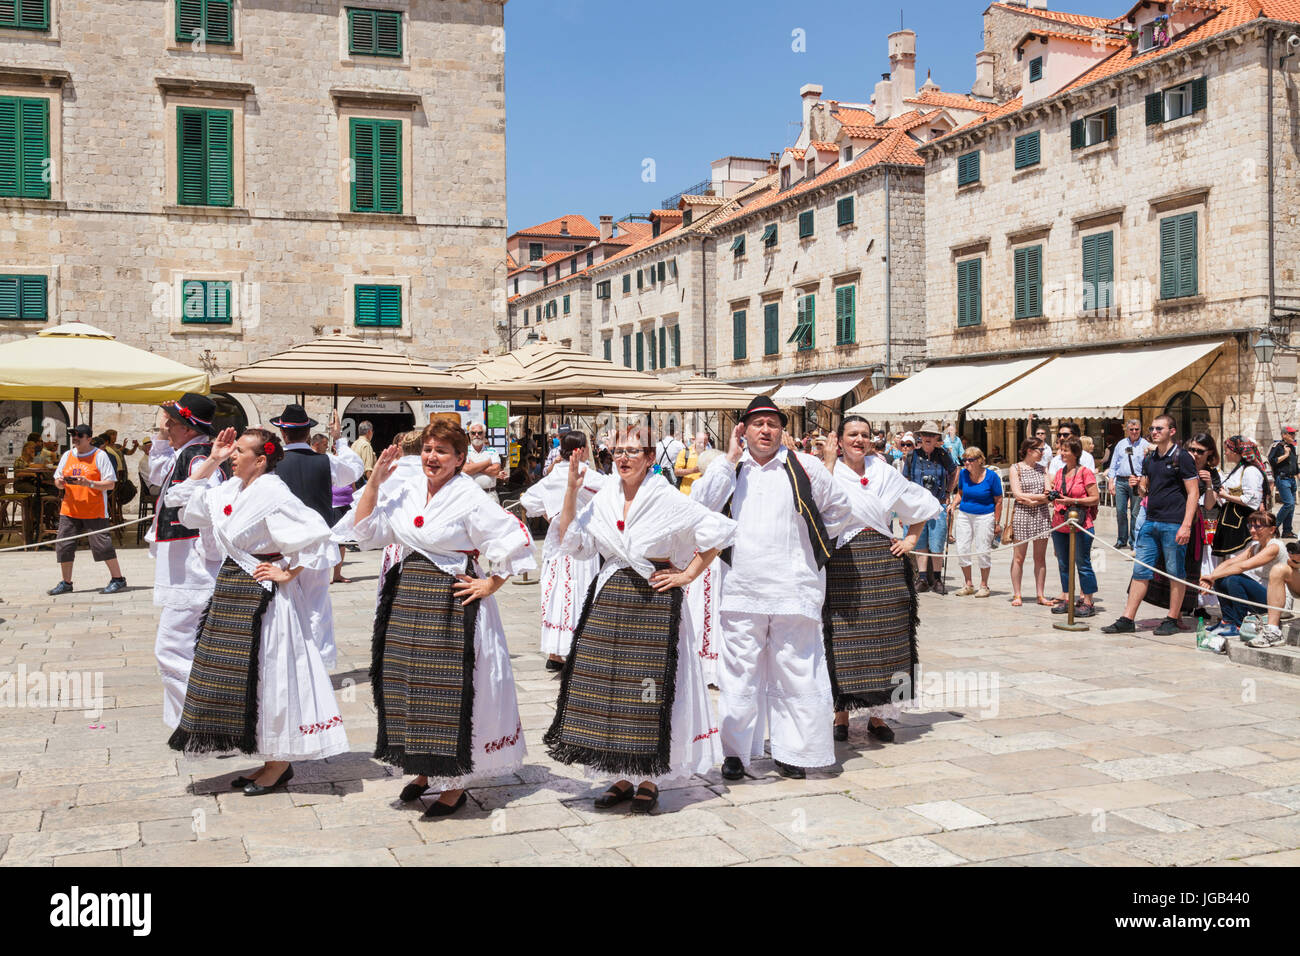 Croatie Dubrovnik Croatie côte Dalmate touristes population locale la danse folklorique en costume national Photo Stock